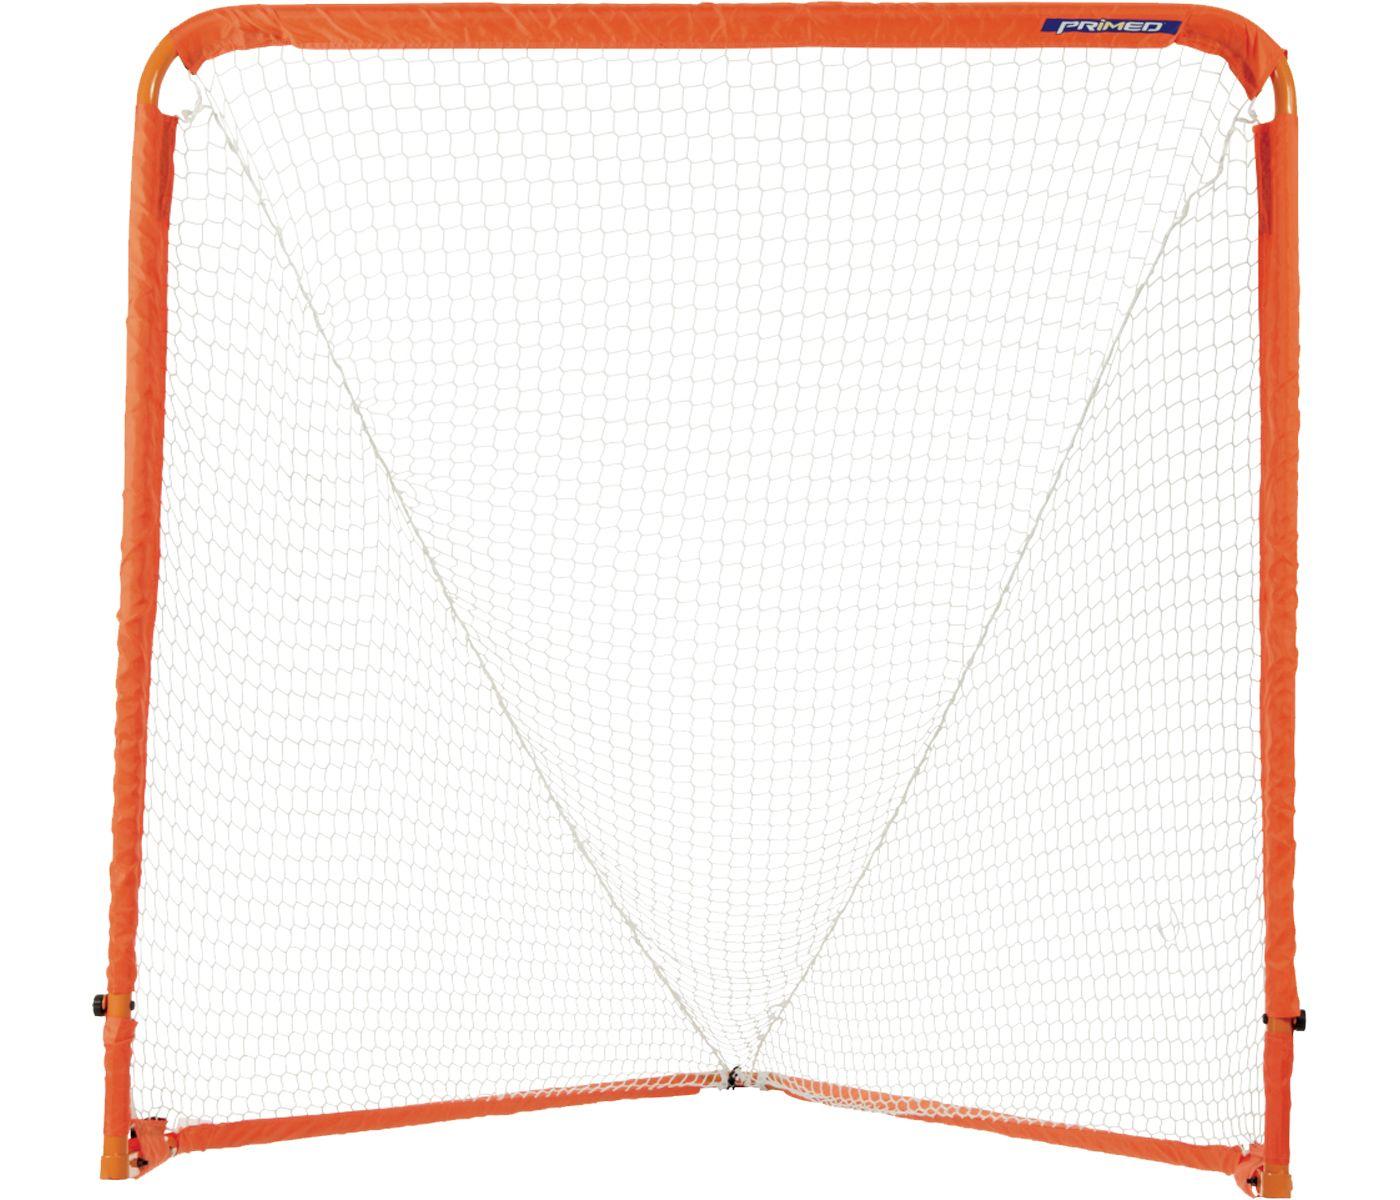 PRIMED 6' x 6' Folding Metal Lacrosse Goal